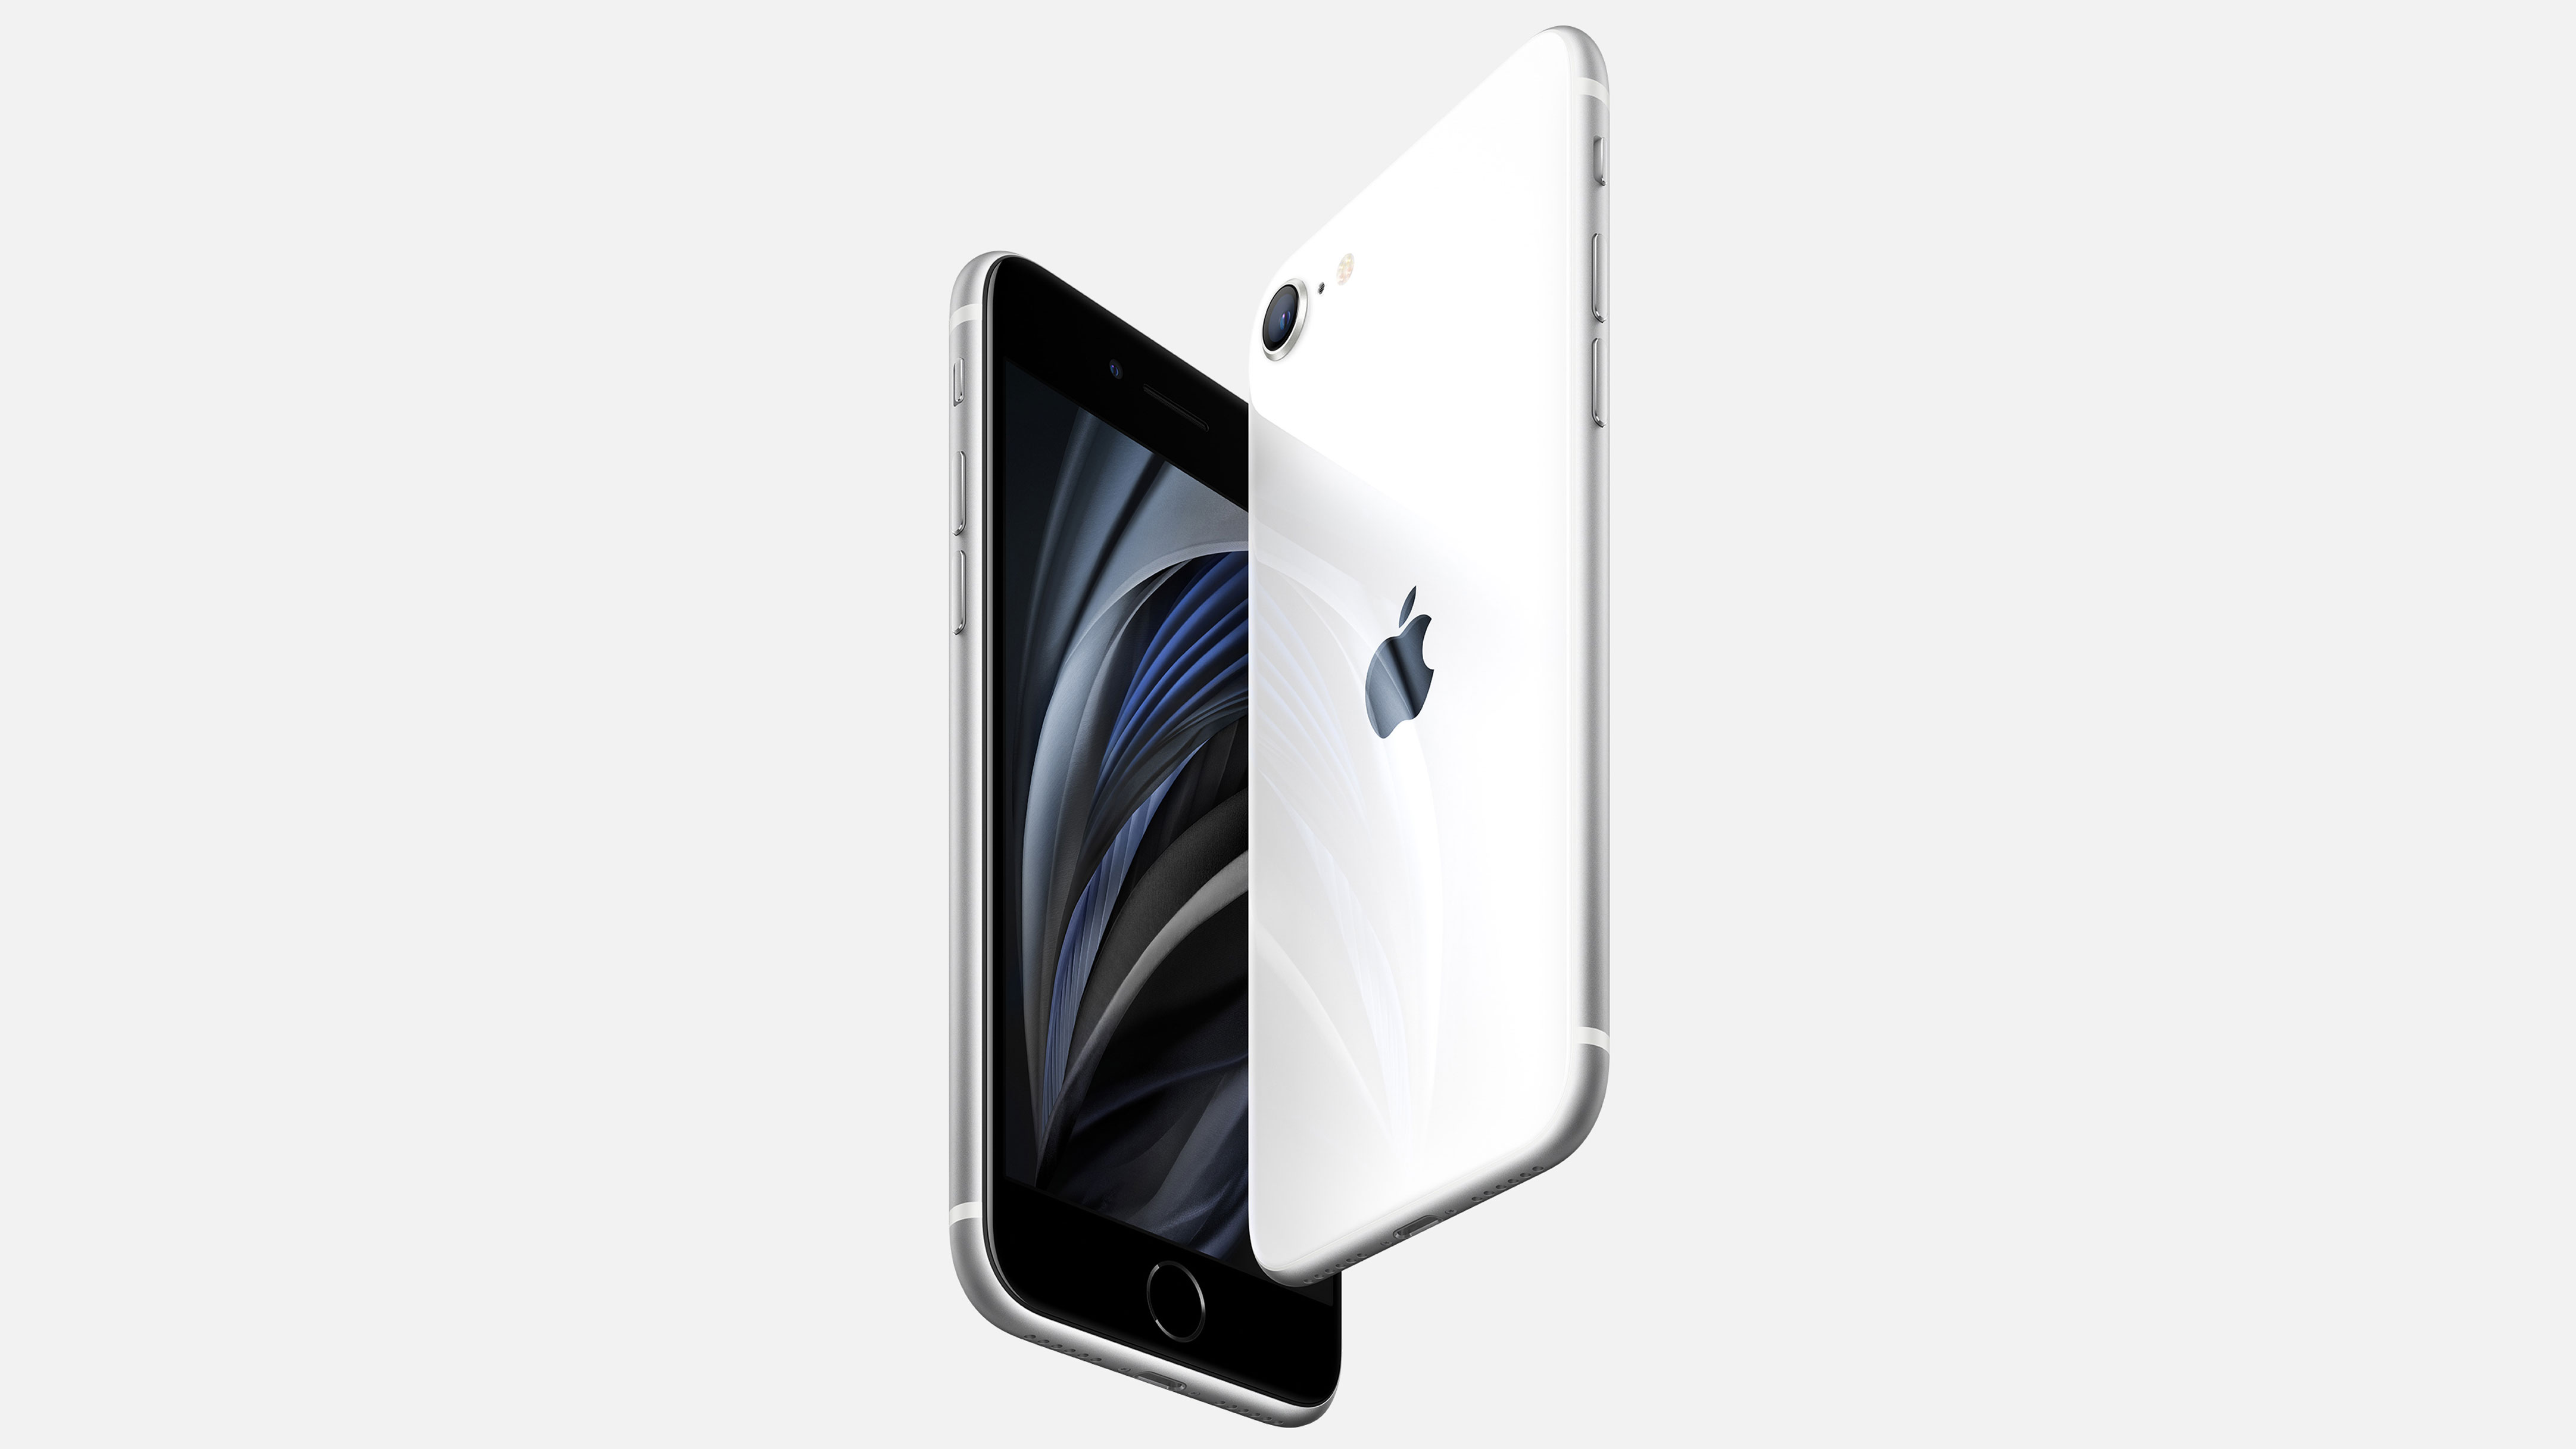 Iphone Se 2020 price in Pakistan